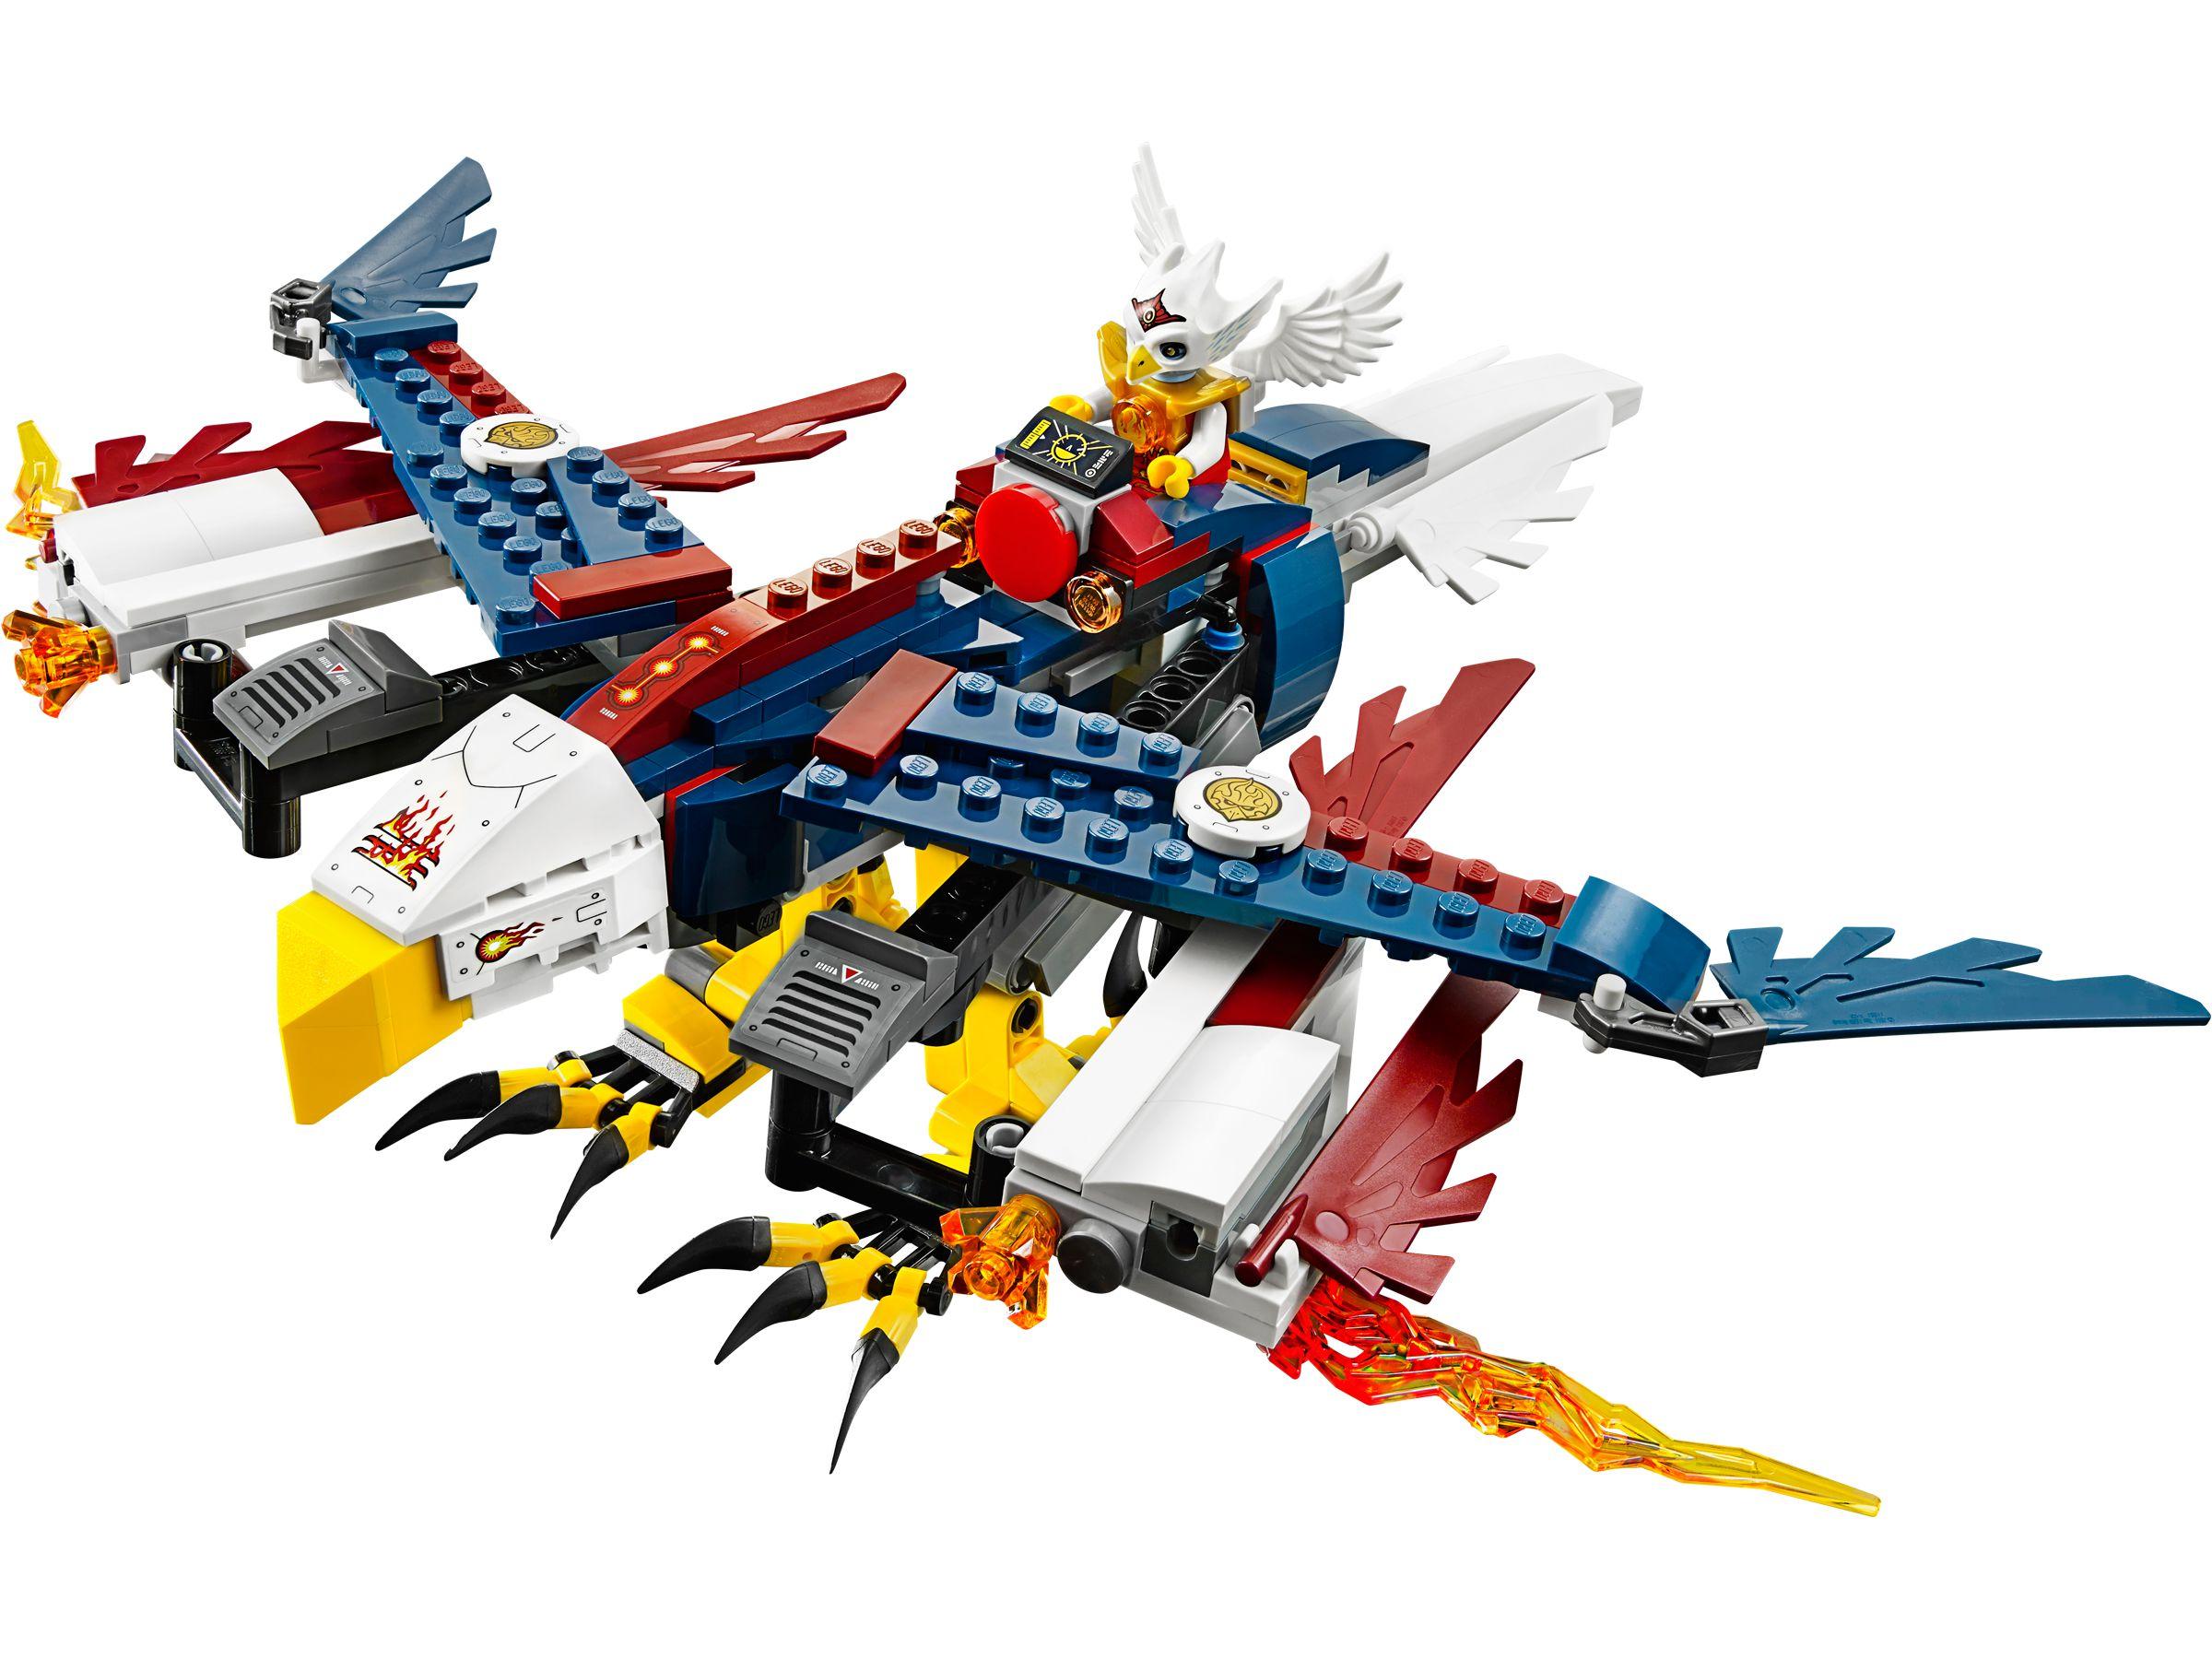 Lego legends of chima 70142 eris feueradler brickmerge preisvergleich - Image de lego chima ...